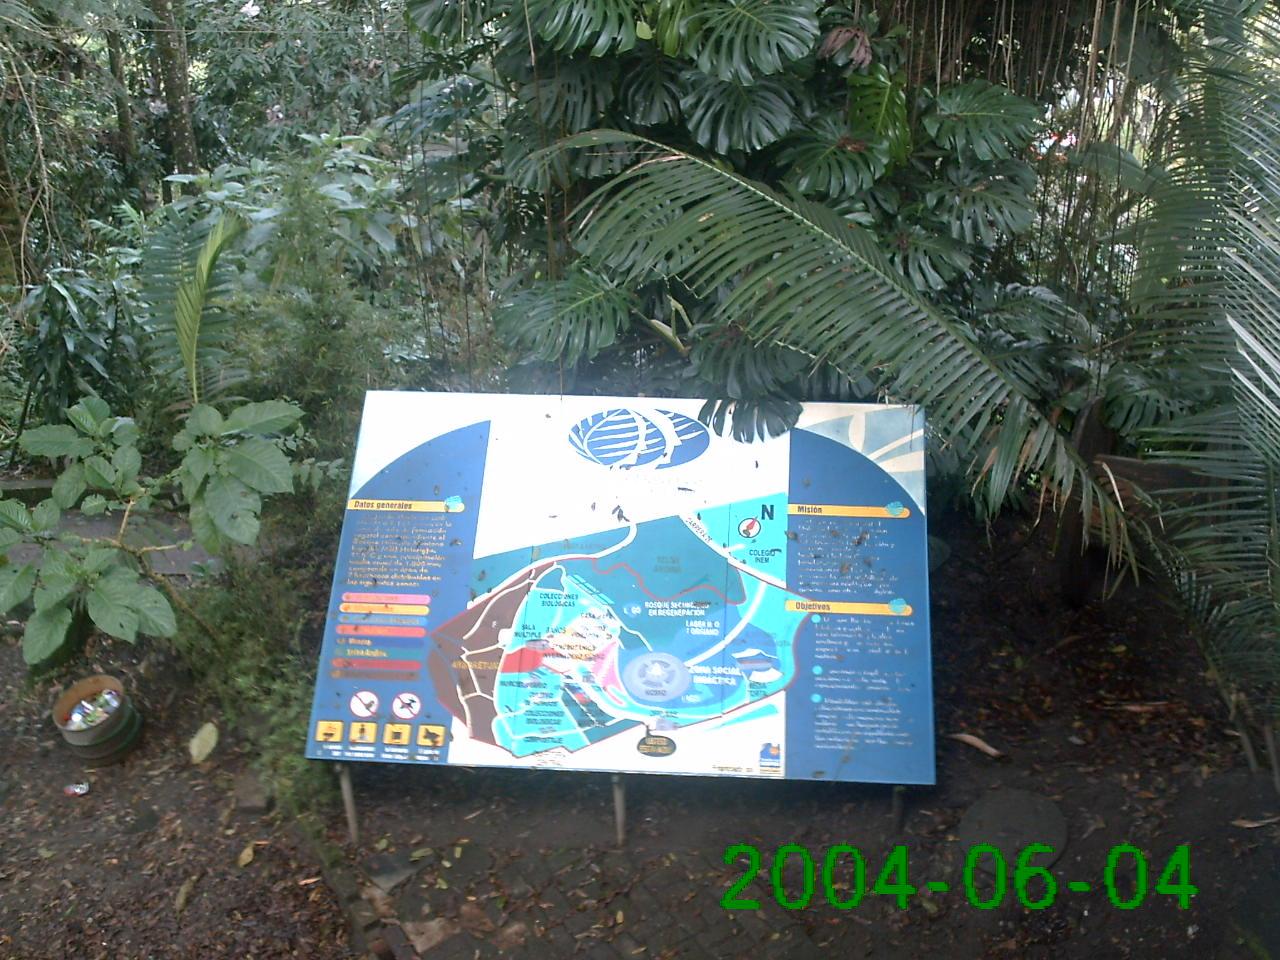 Modelo sistemico jardin botanico fotos del jadin for Costo entrada jardin botanico